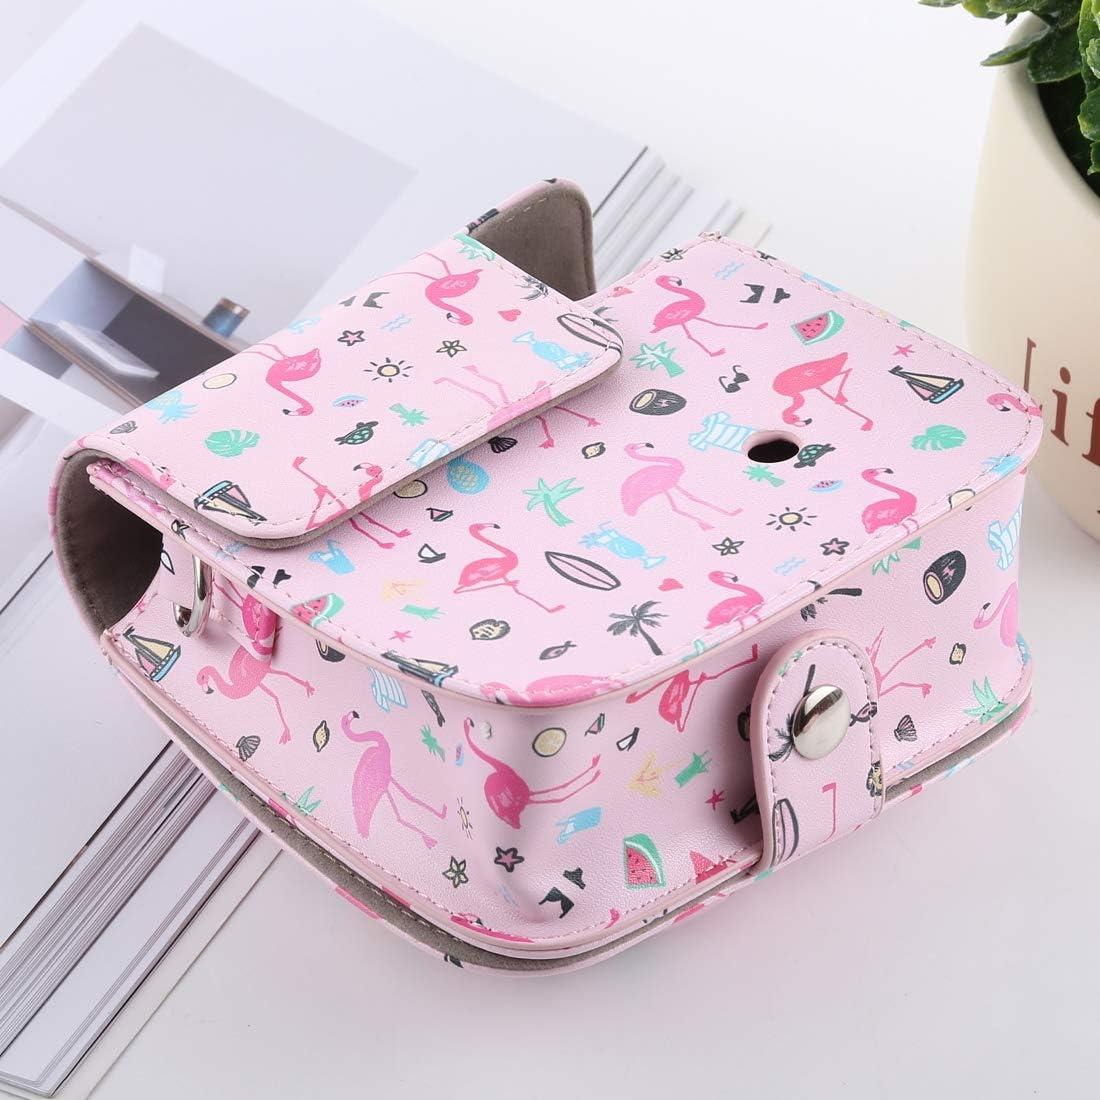 Mini 8+ YANTAIANJANE Camera Accessories Watermelon Flamingo Pattern Full Body Camera PU Leather Case Bag with Strap for FUJIFILM instax Mini 9 Mini 8